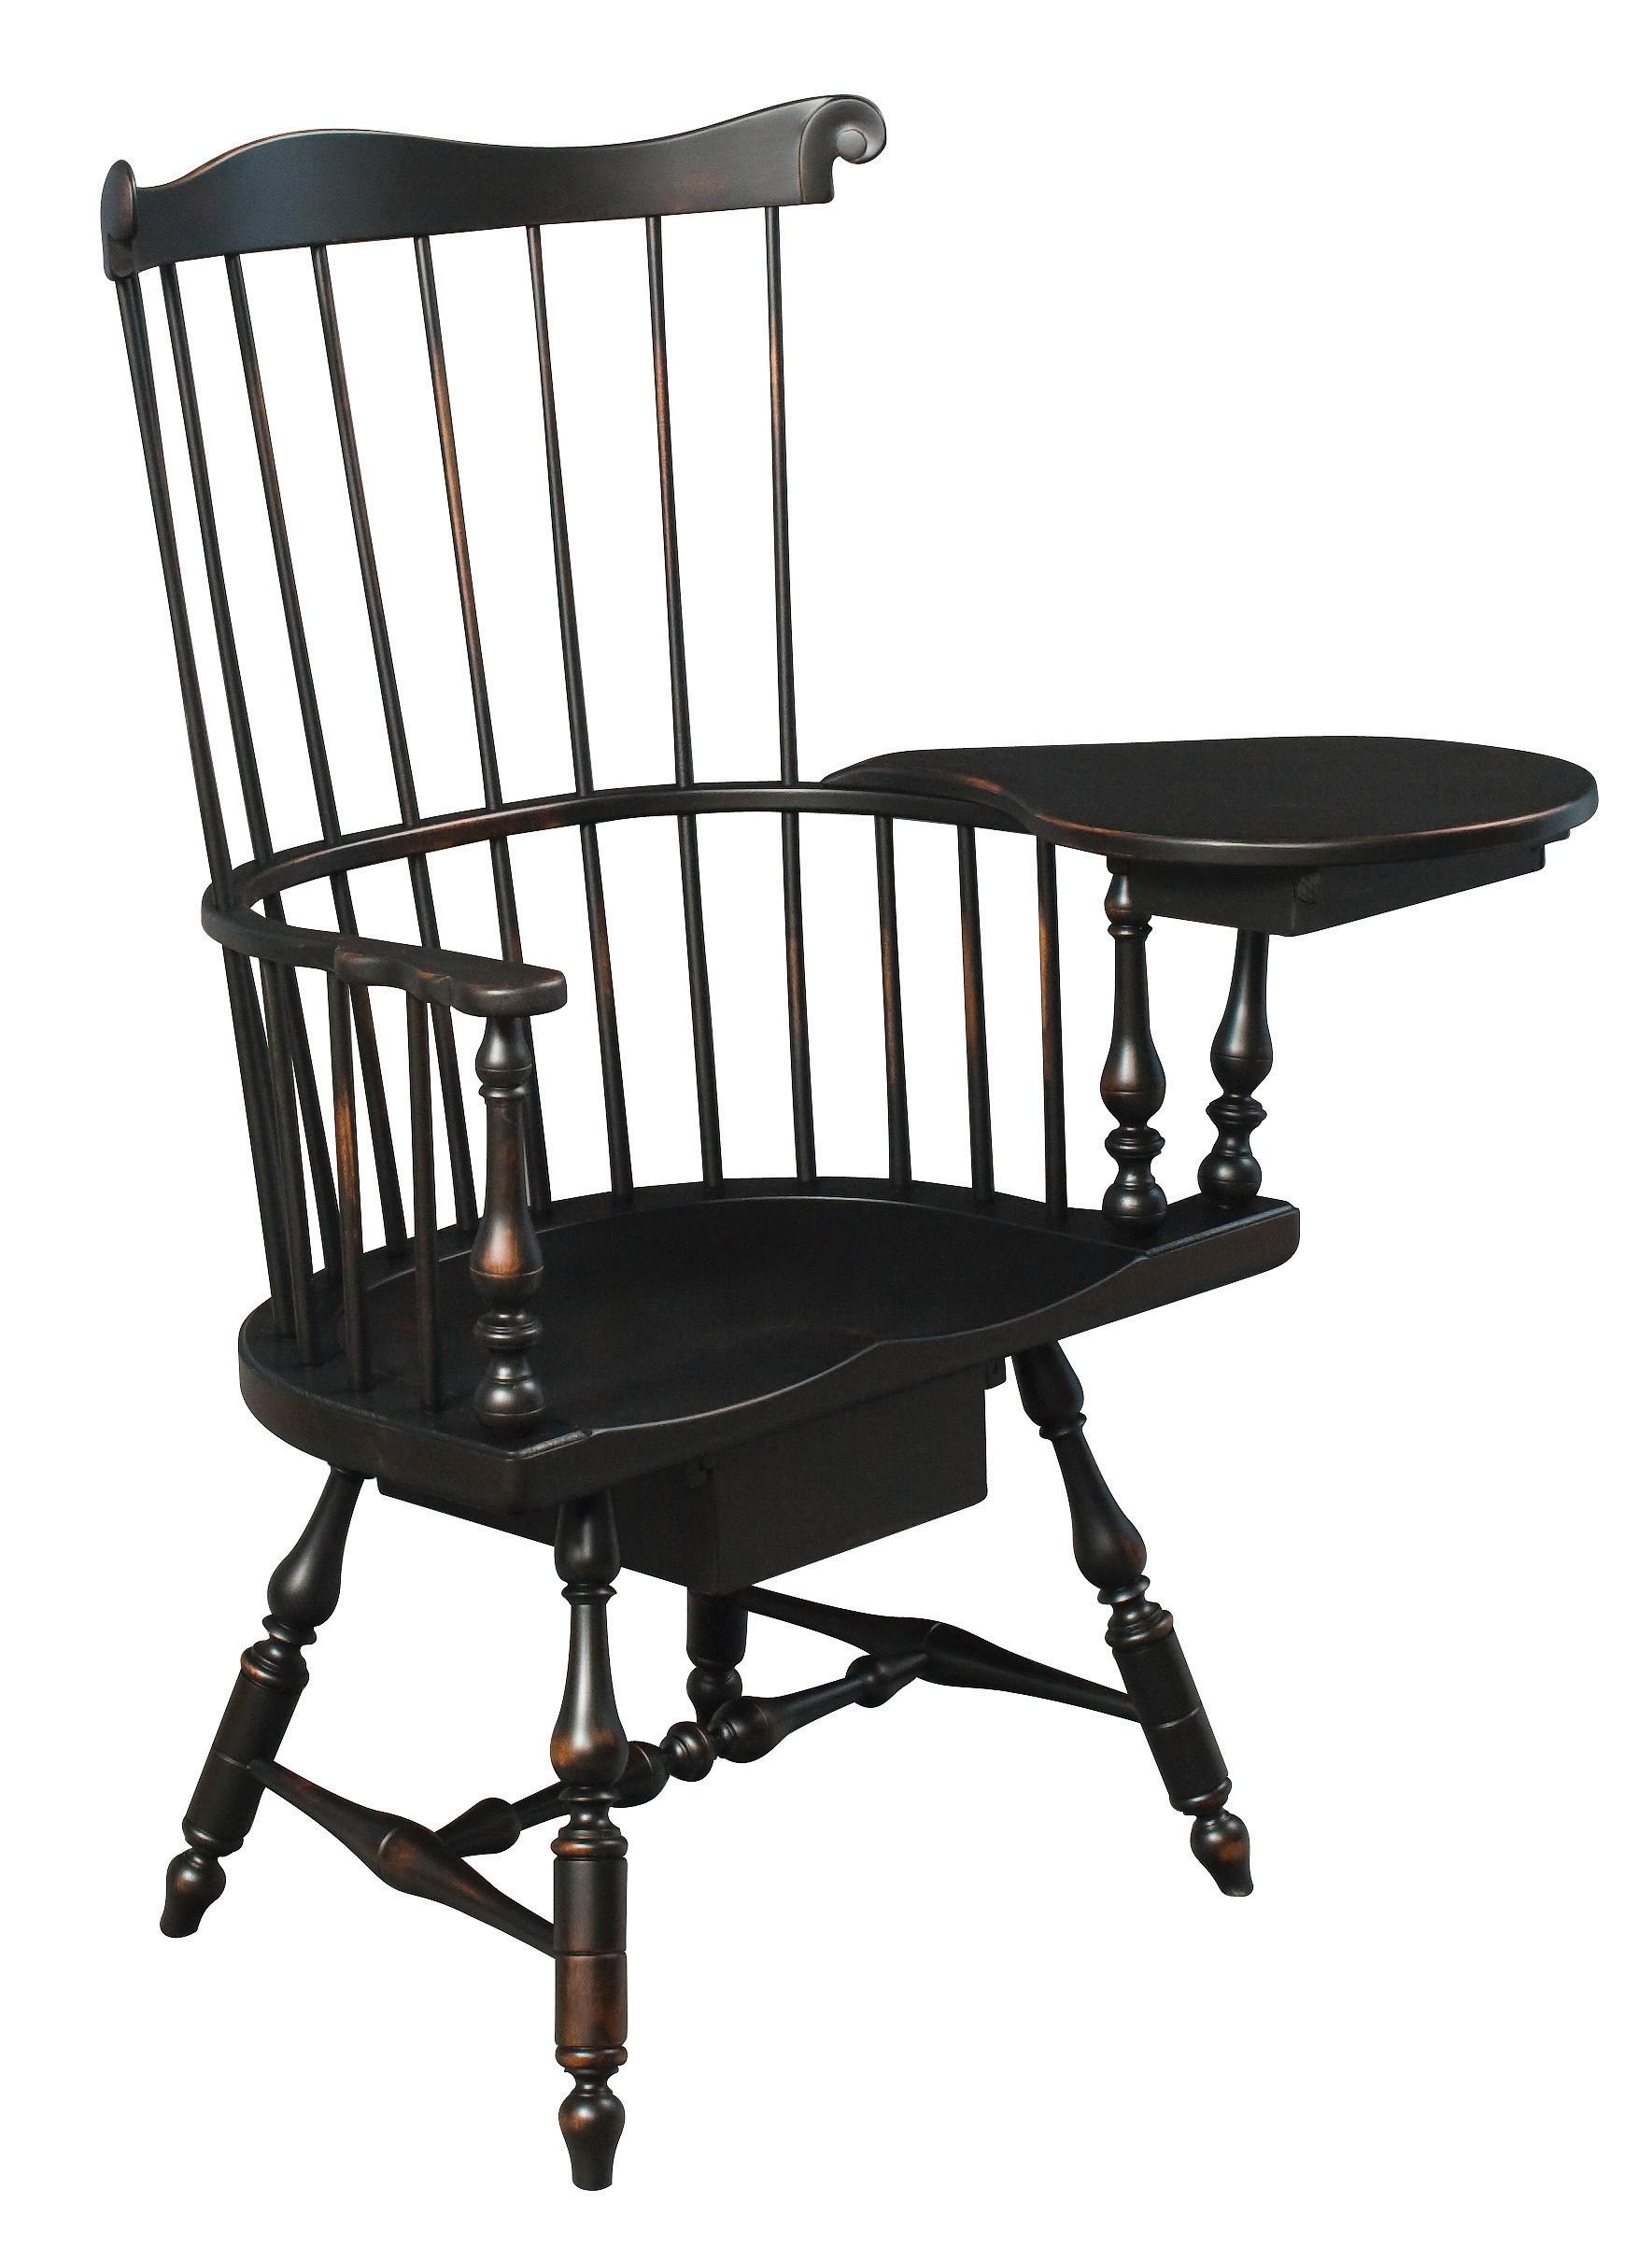 Eh philadelphia fanback windsor chair amish furniture